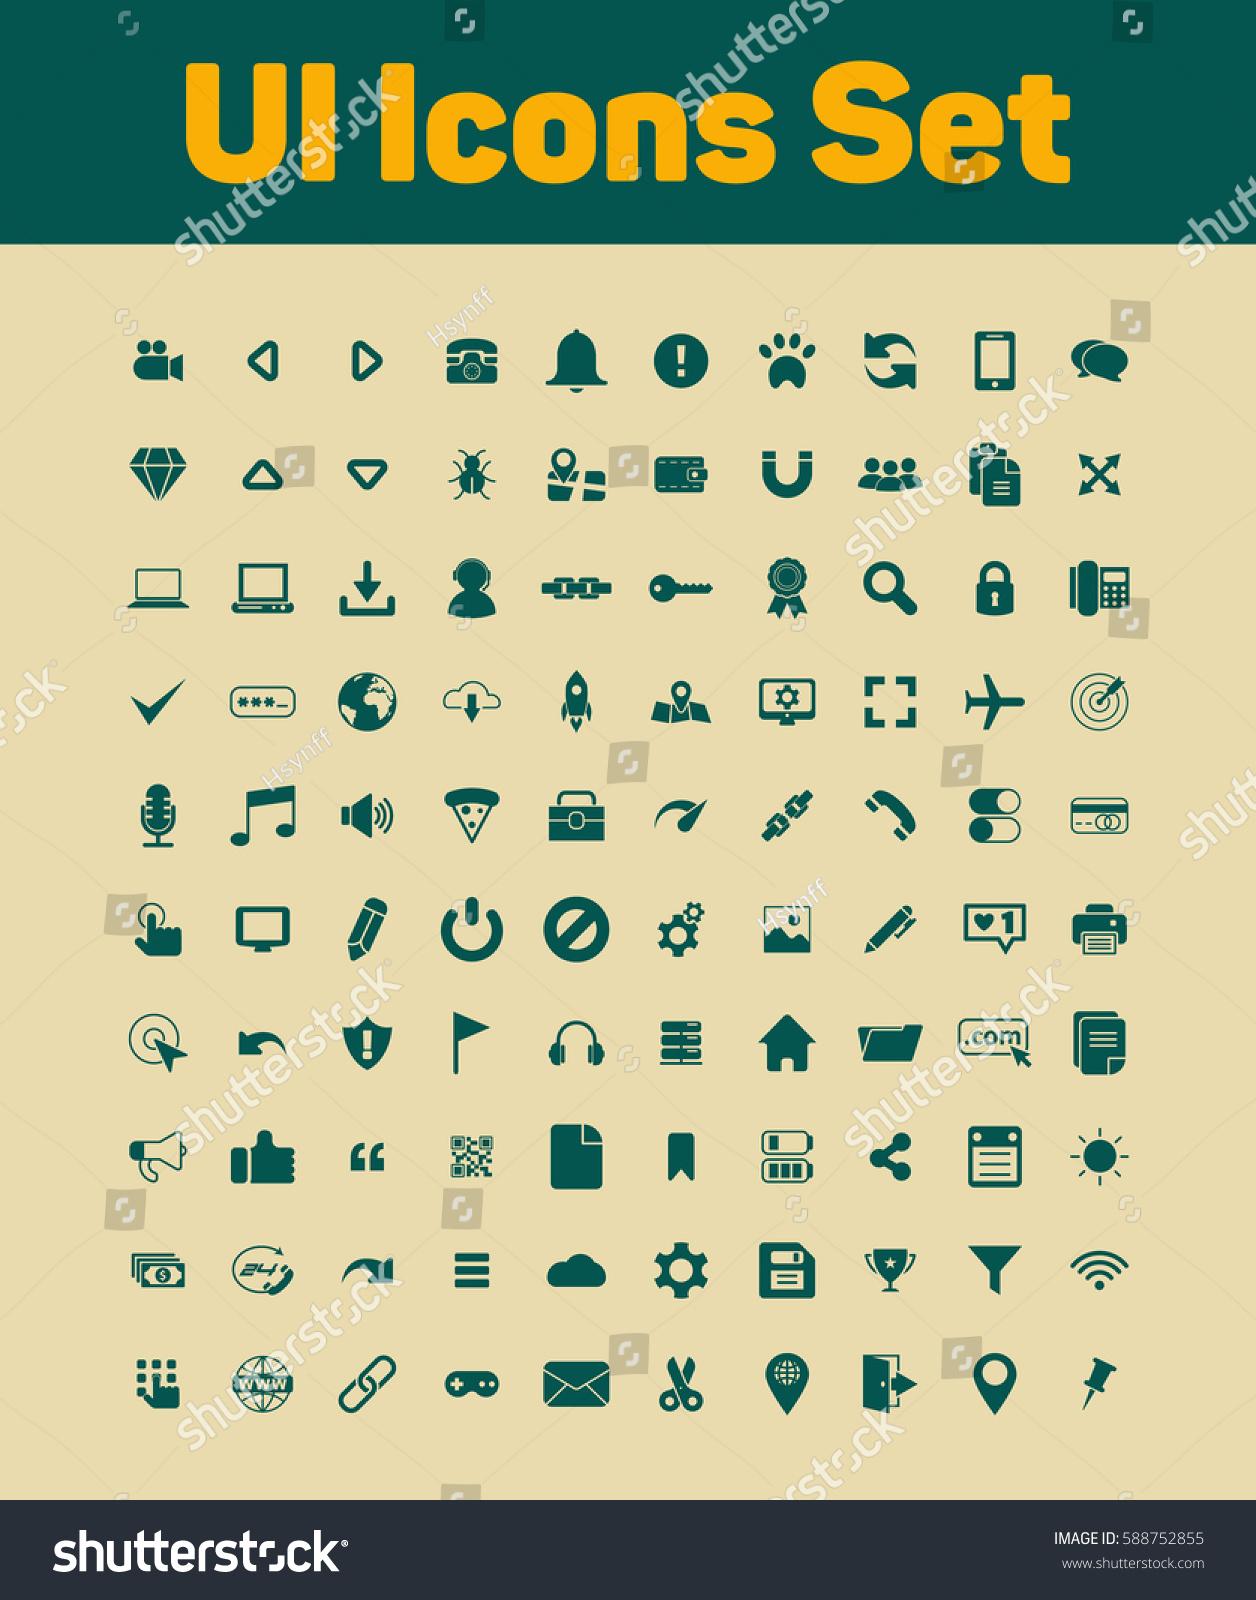 Ui Icons Set Stock Vector 588752855 - Shutterstock